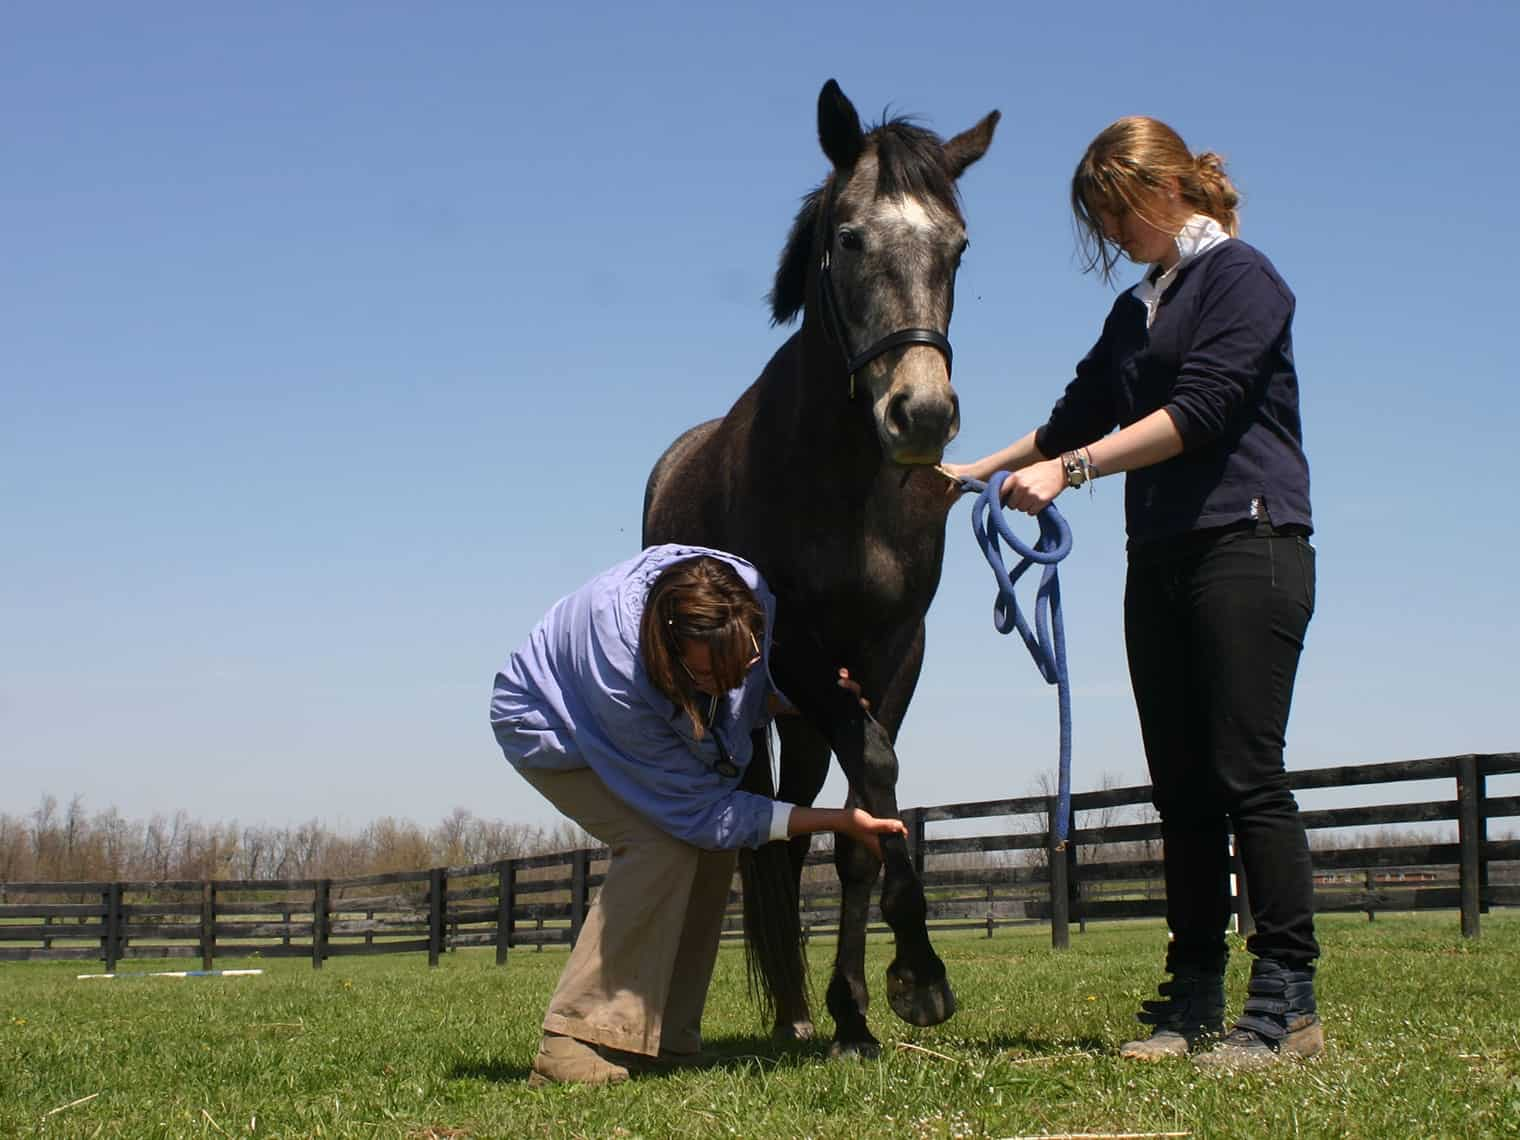 Is My Horse Neurologic or Lame? – The Horse